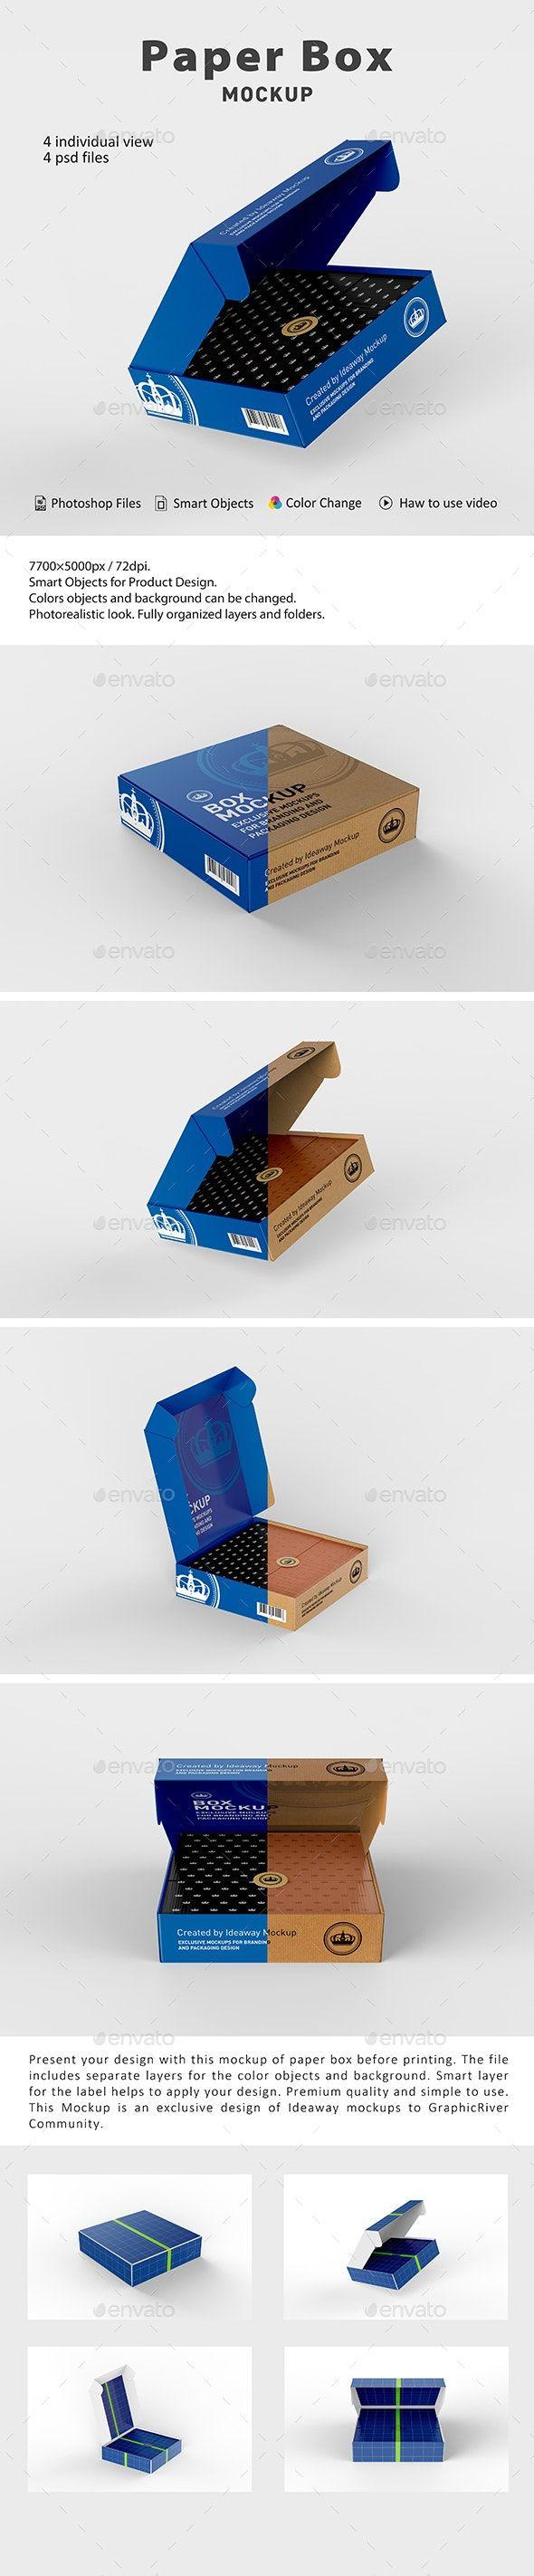 Download Paper Box Mockup Box Mockup Paper Box Mockup